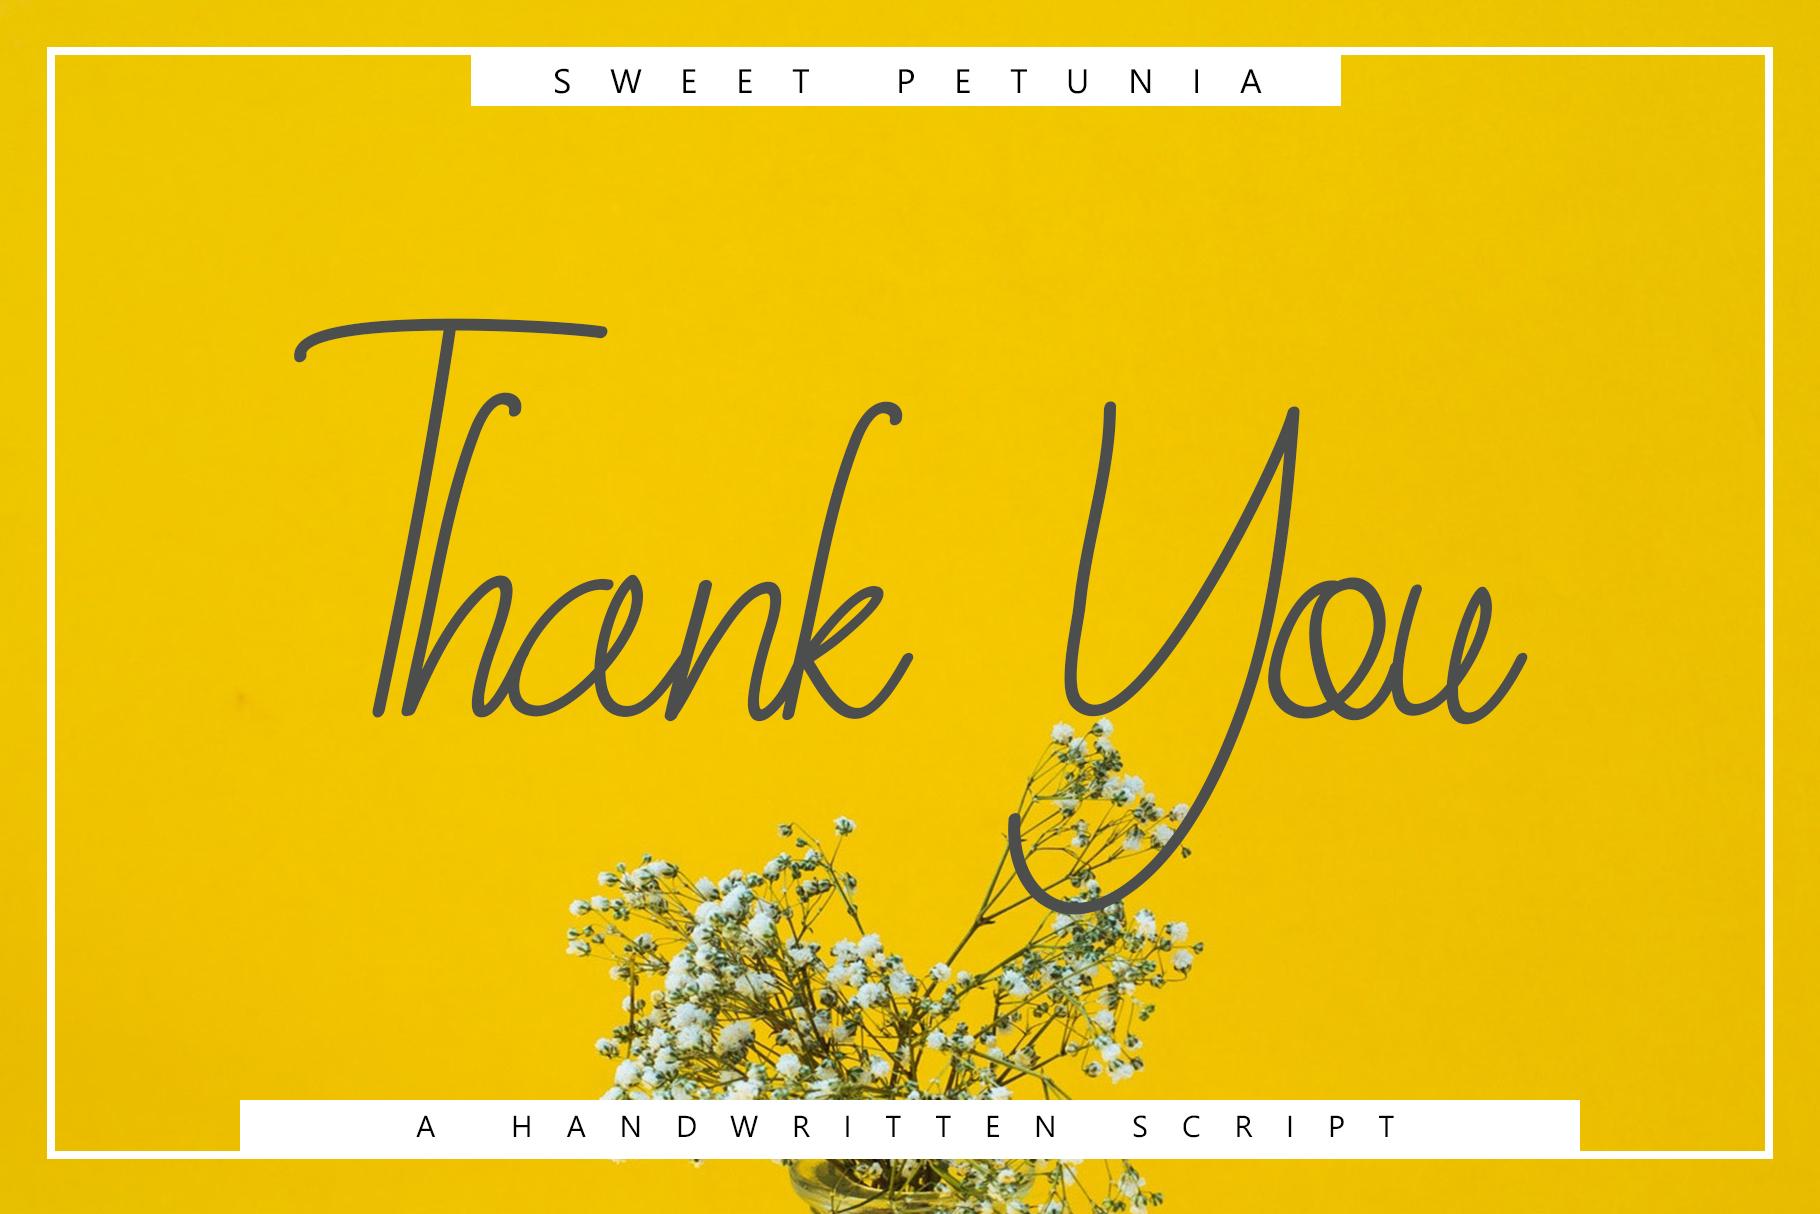 Sweet Petunia Handwritten Script example image 7